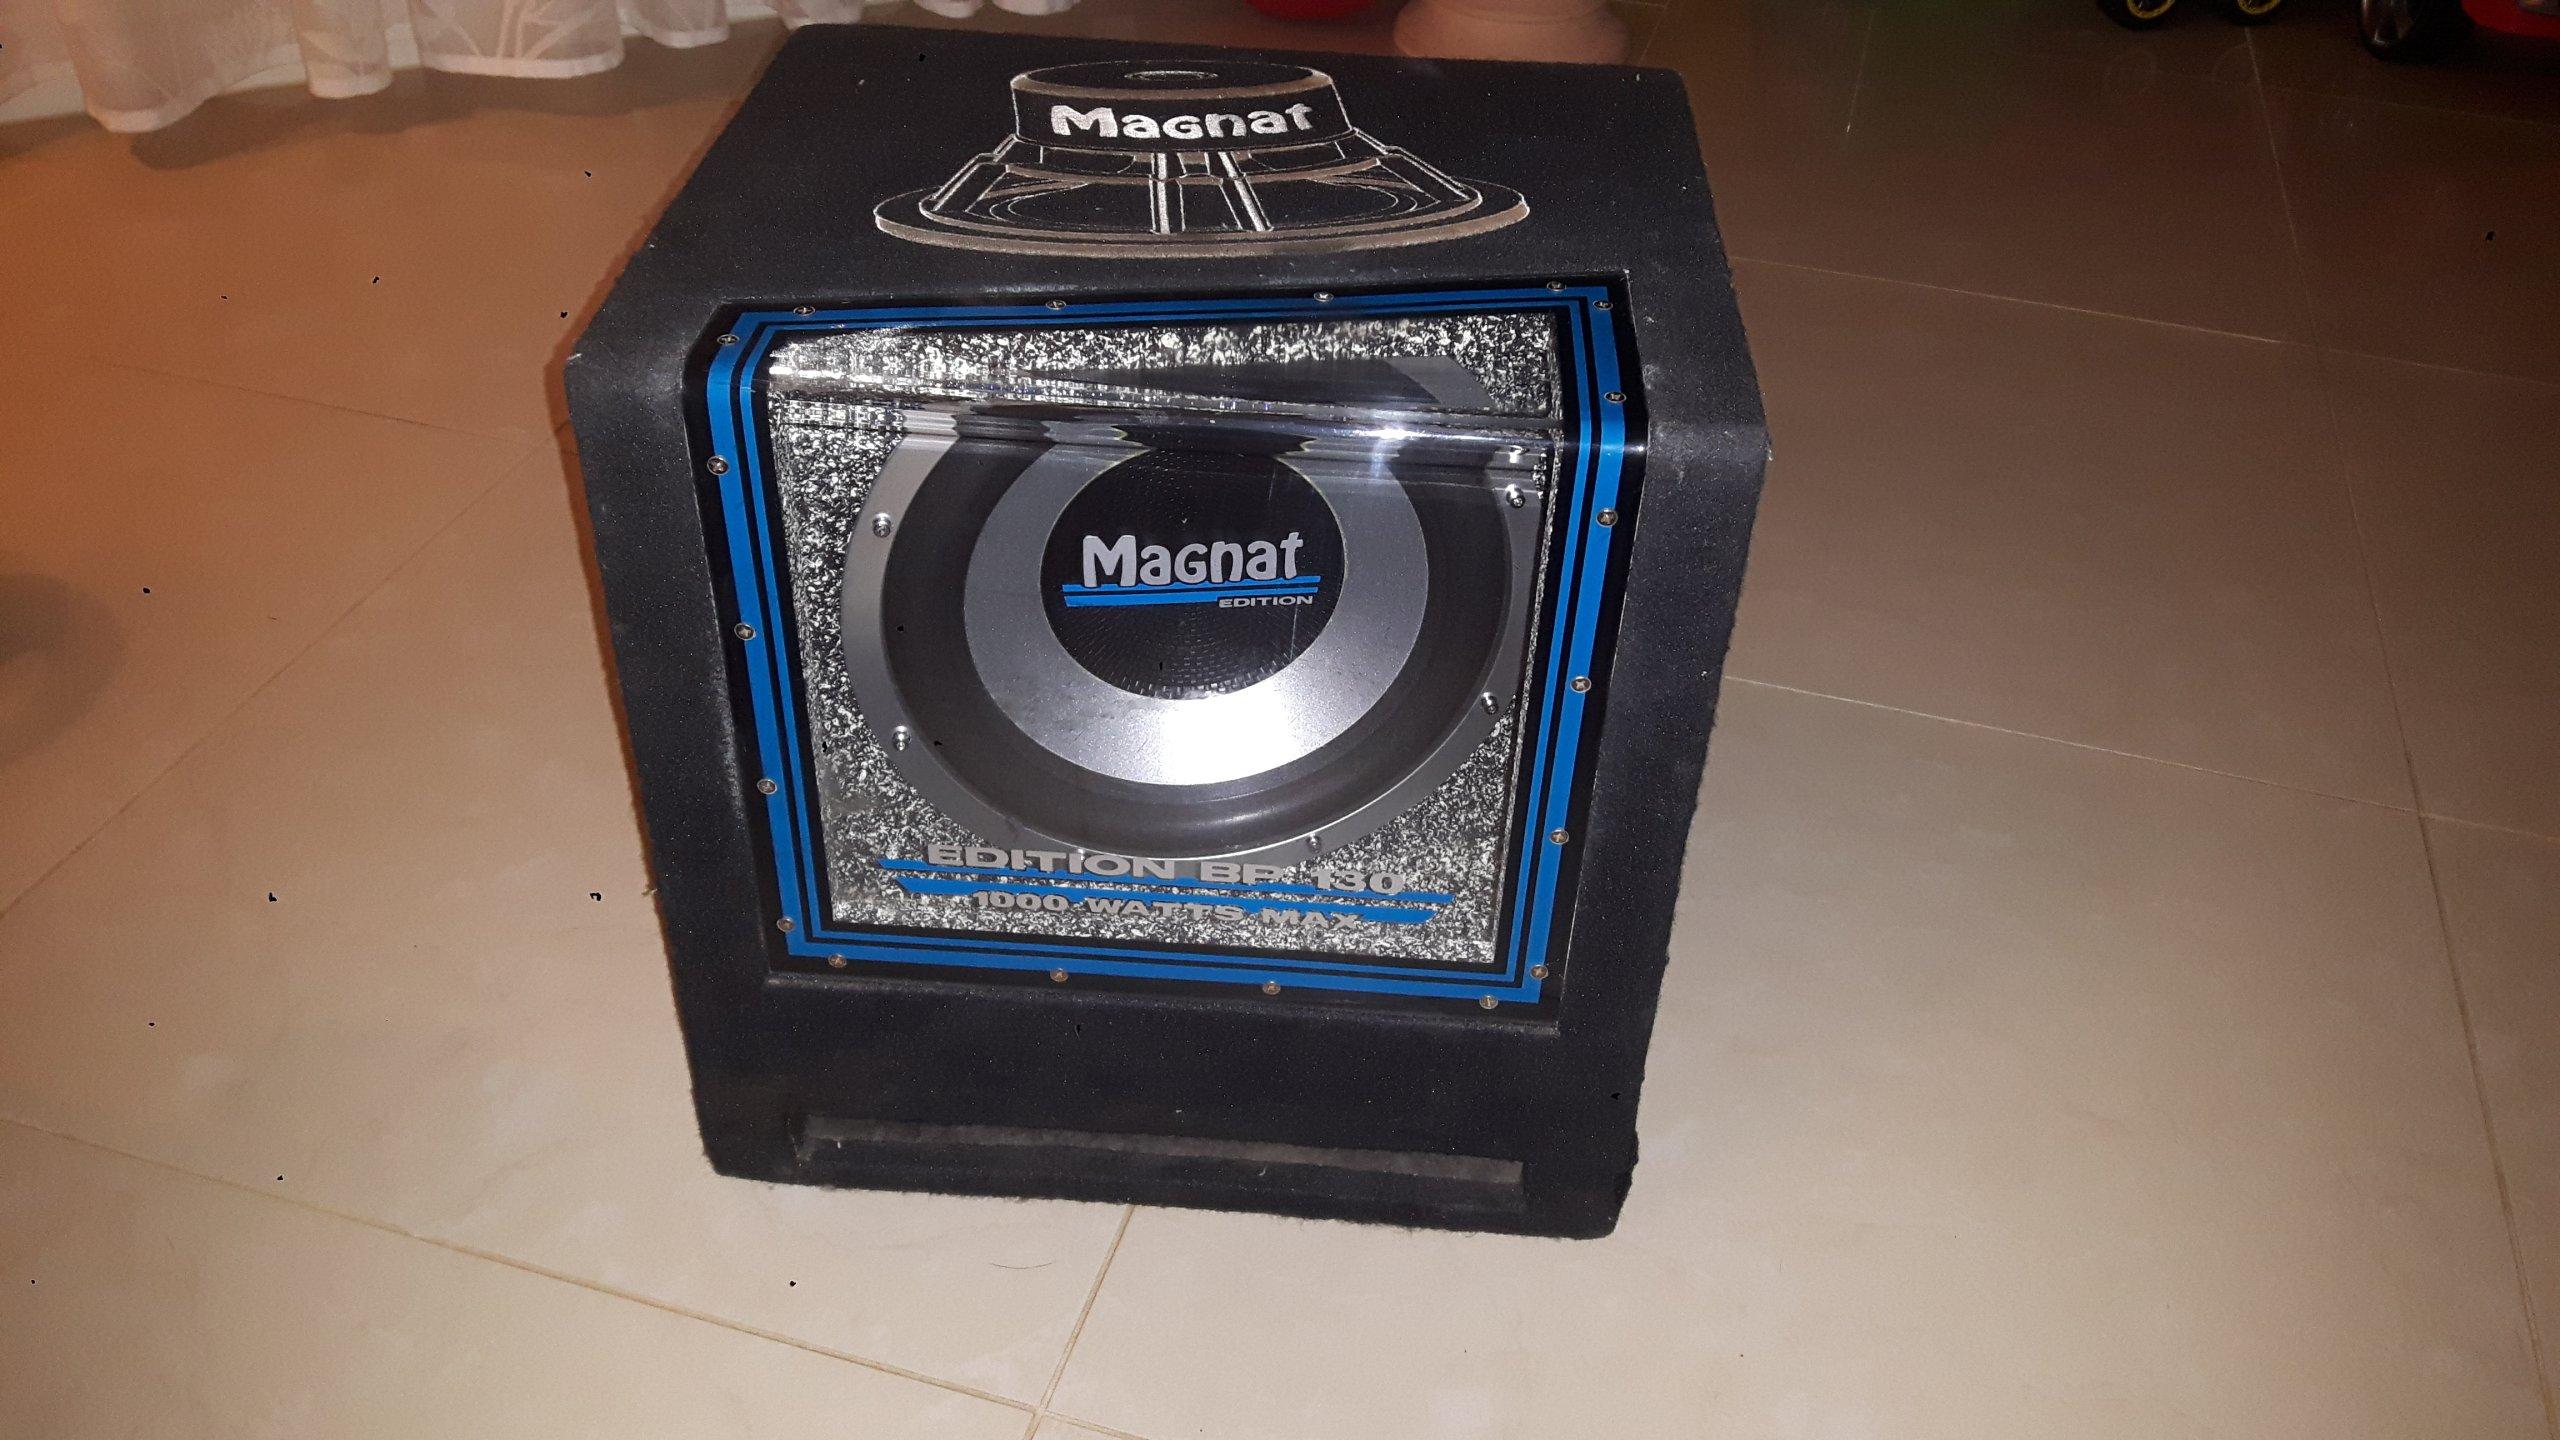 Magnat subwoofer (bp 30 series ii) 2 monate alt forum: car hifi.